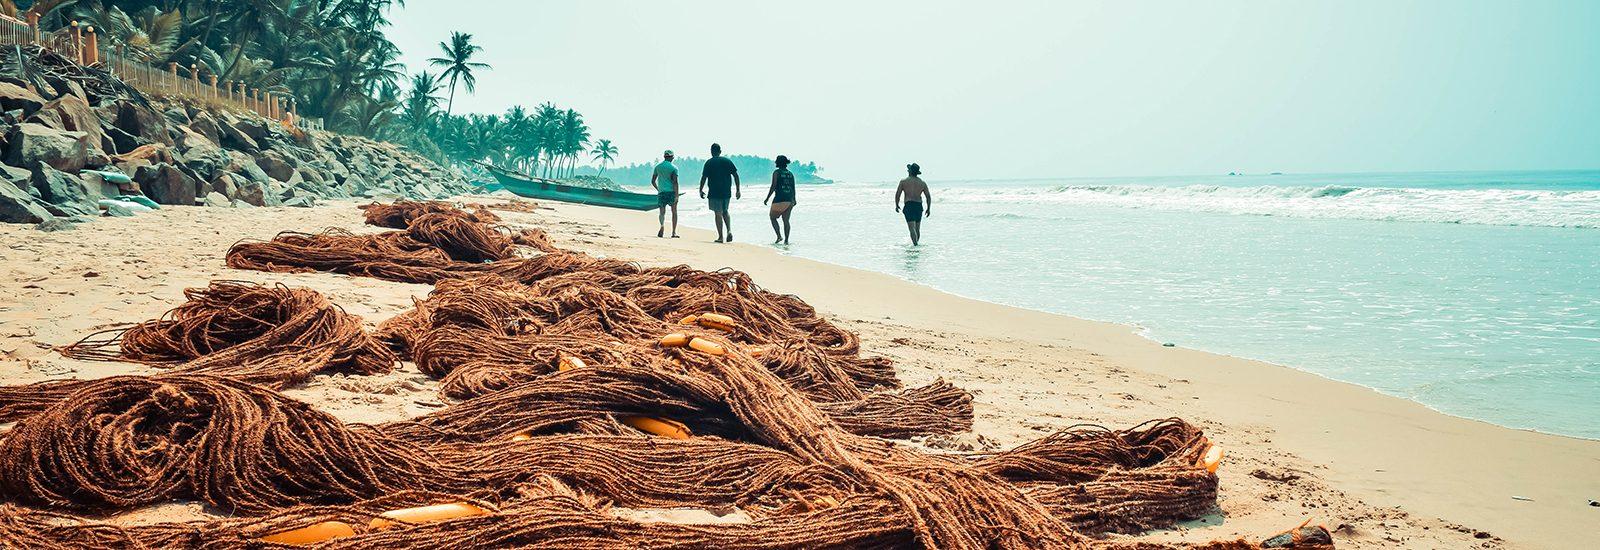 Sri Lanka Gintota beach